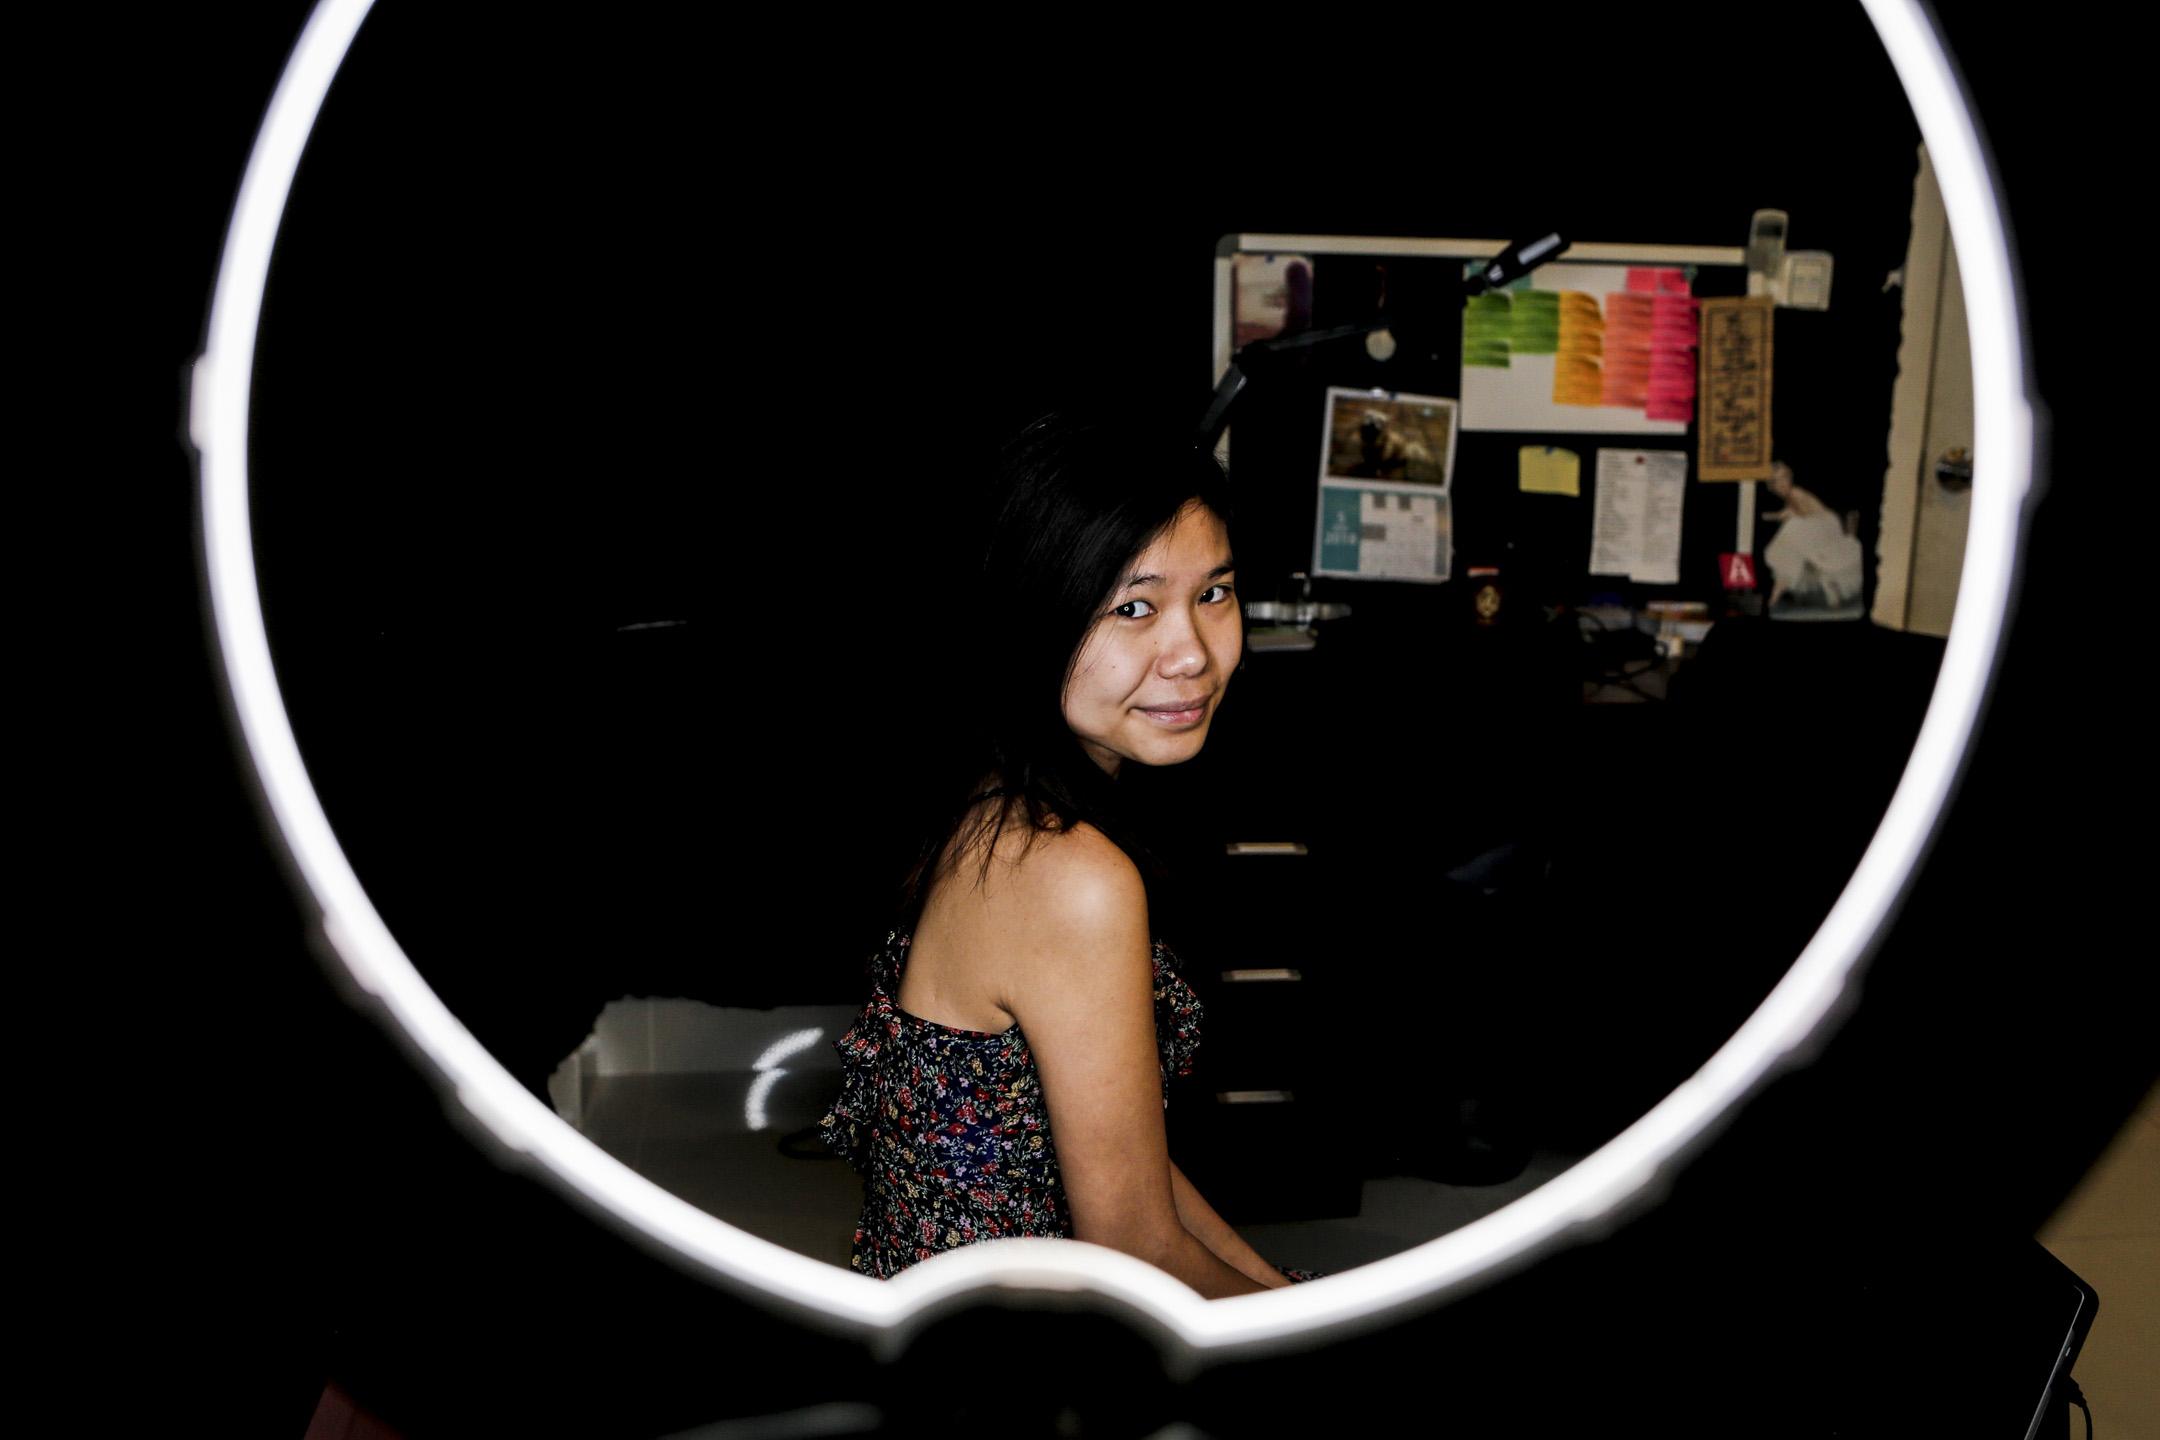 Catherine Harry 今年23歲,來自柬埔寨首都金邊,在2018獲 FOCUS 雜誌評選柬埔寨年度十大影響力創業家及富比世30歲以下亞洲最具影響力青年之一 。她描述自己是一位女權主義者,也是性別平等倡議者。 攝:Ann Wang/端傳媒